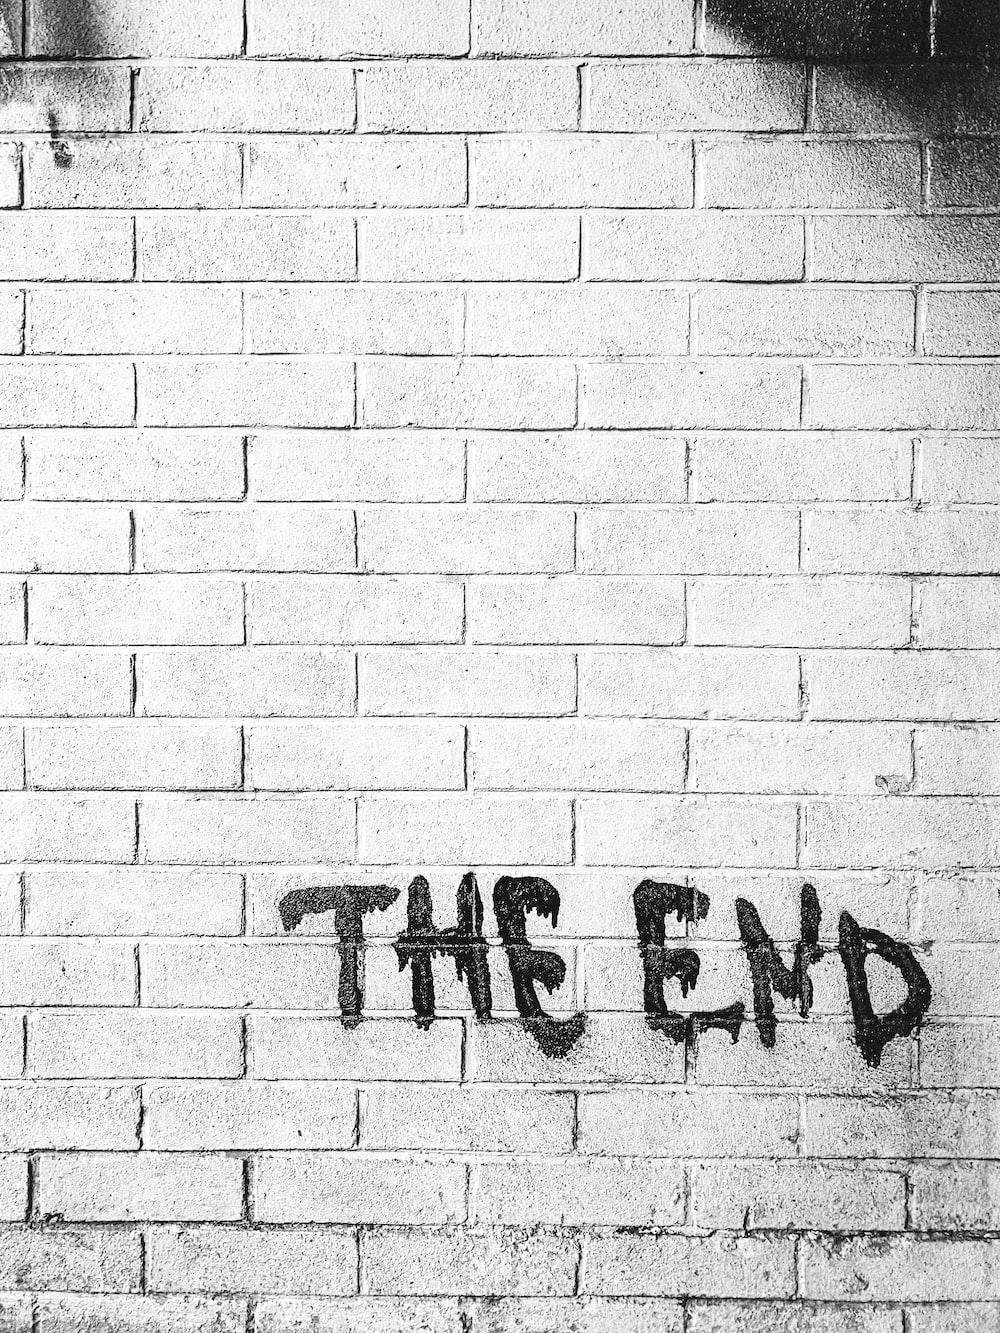 white brick wall with black and white graffiti